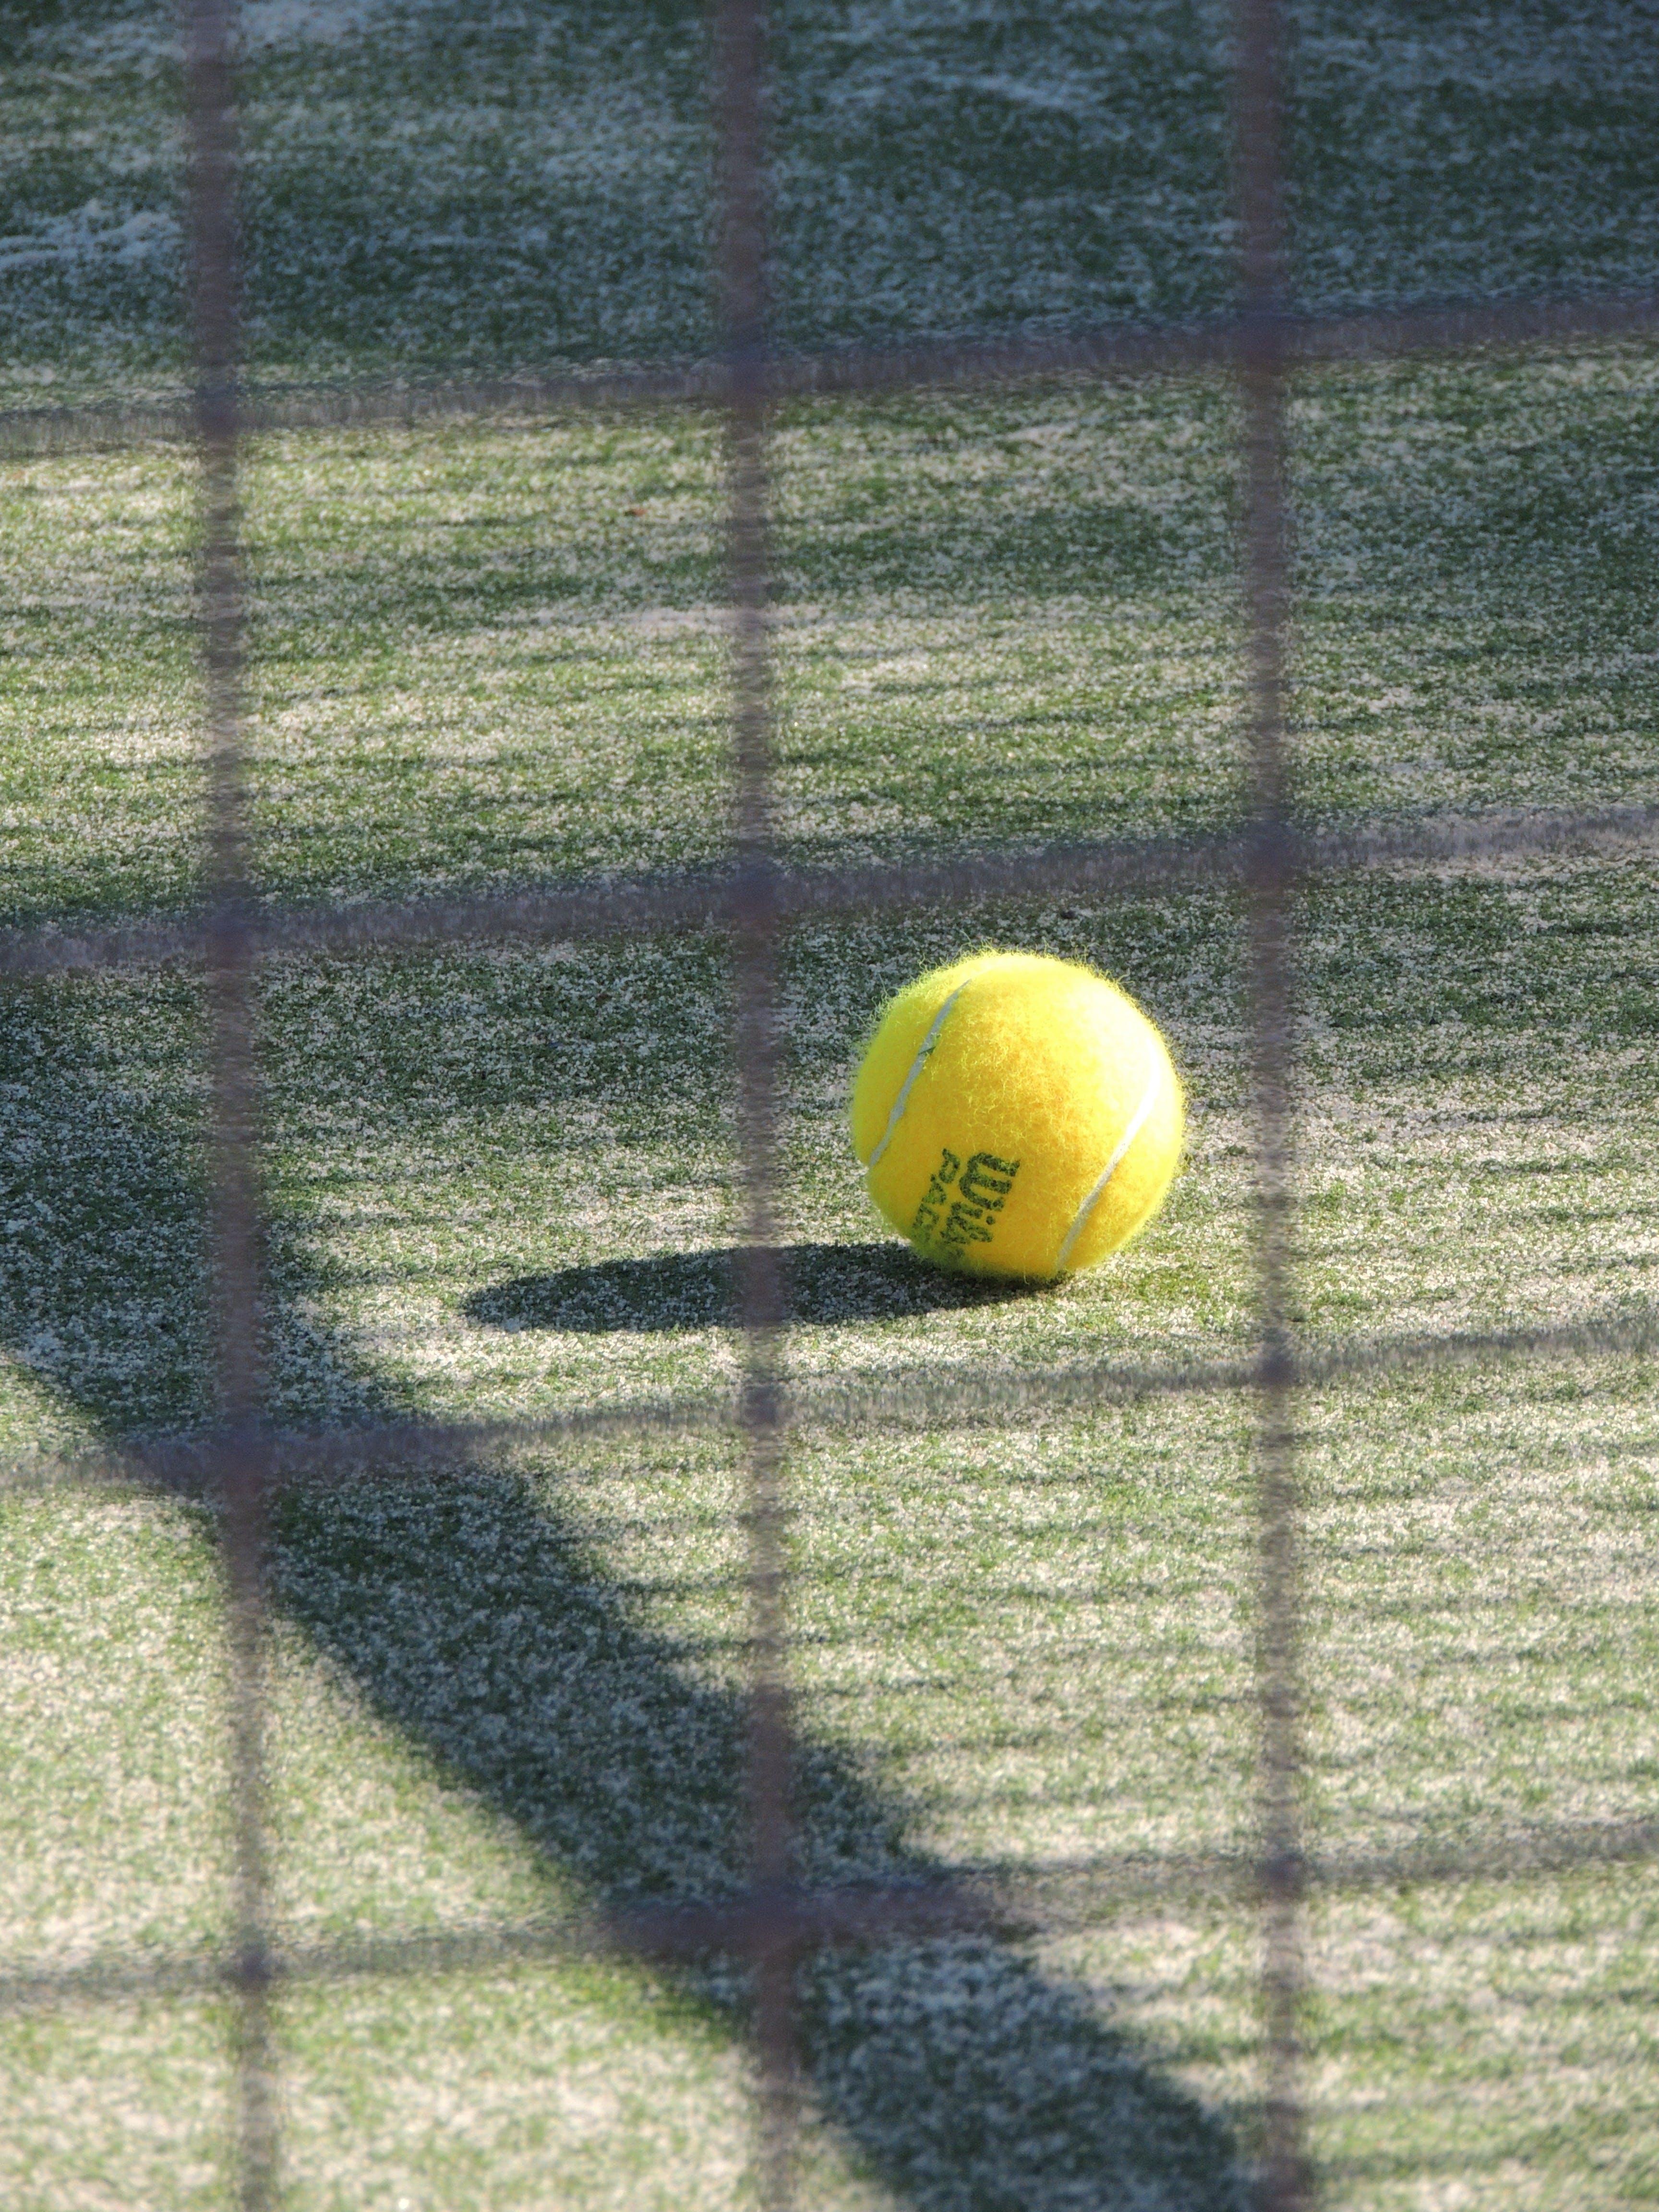 Tennis Ball in Green Grass during Daytime